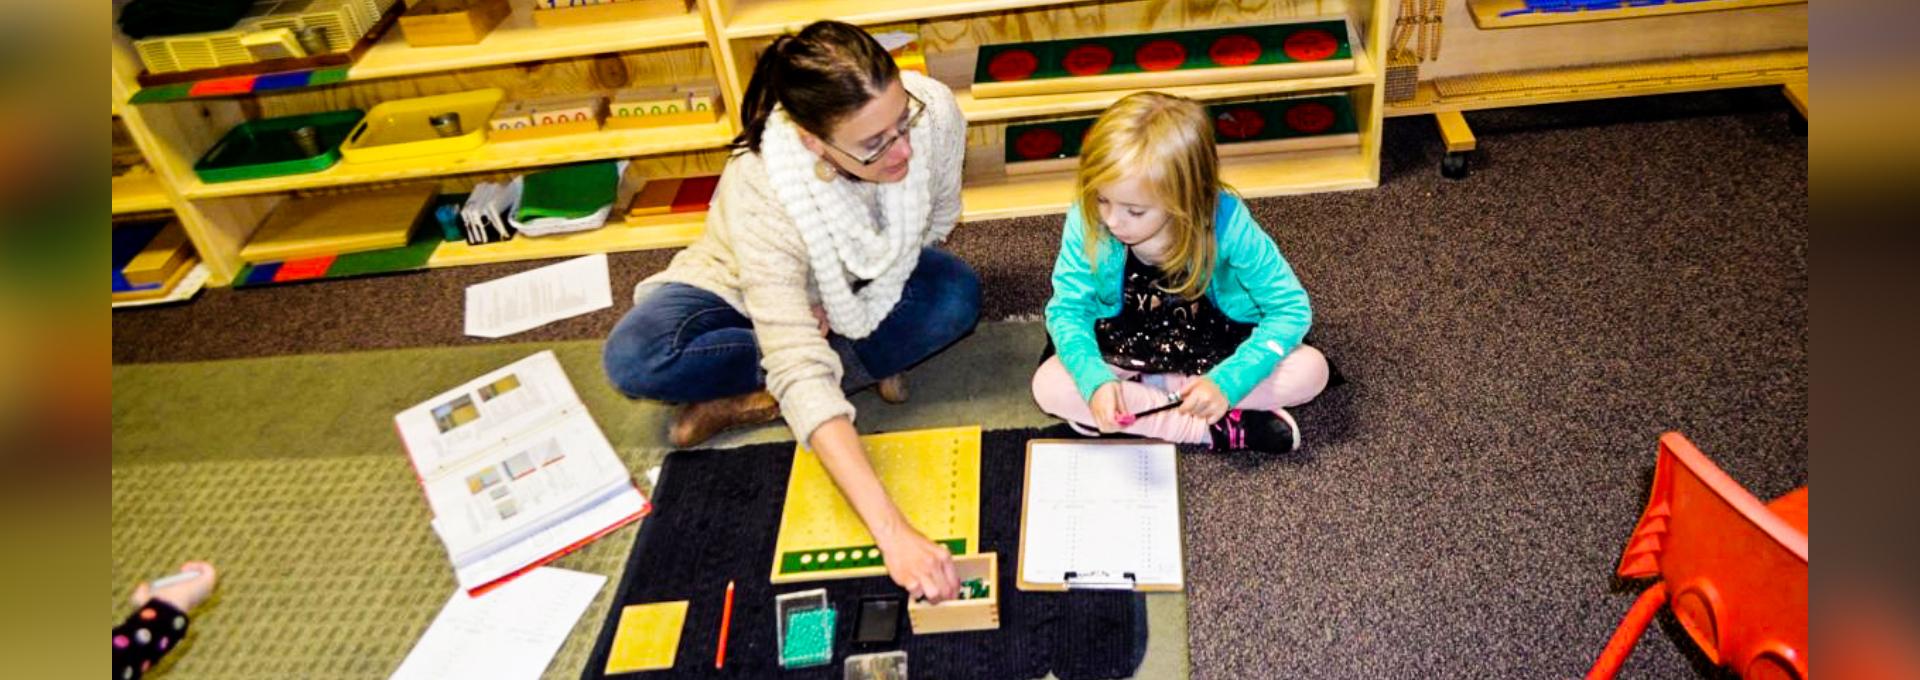 teacher guiding the child